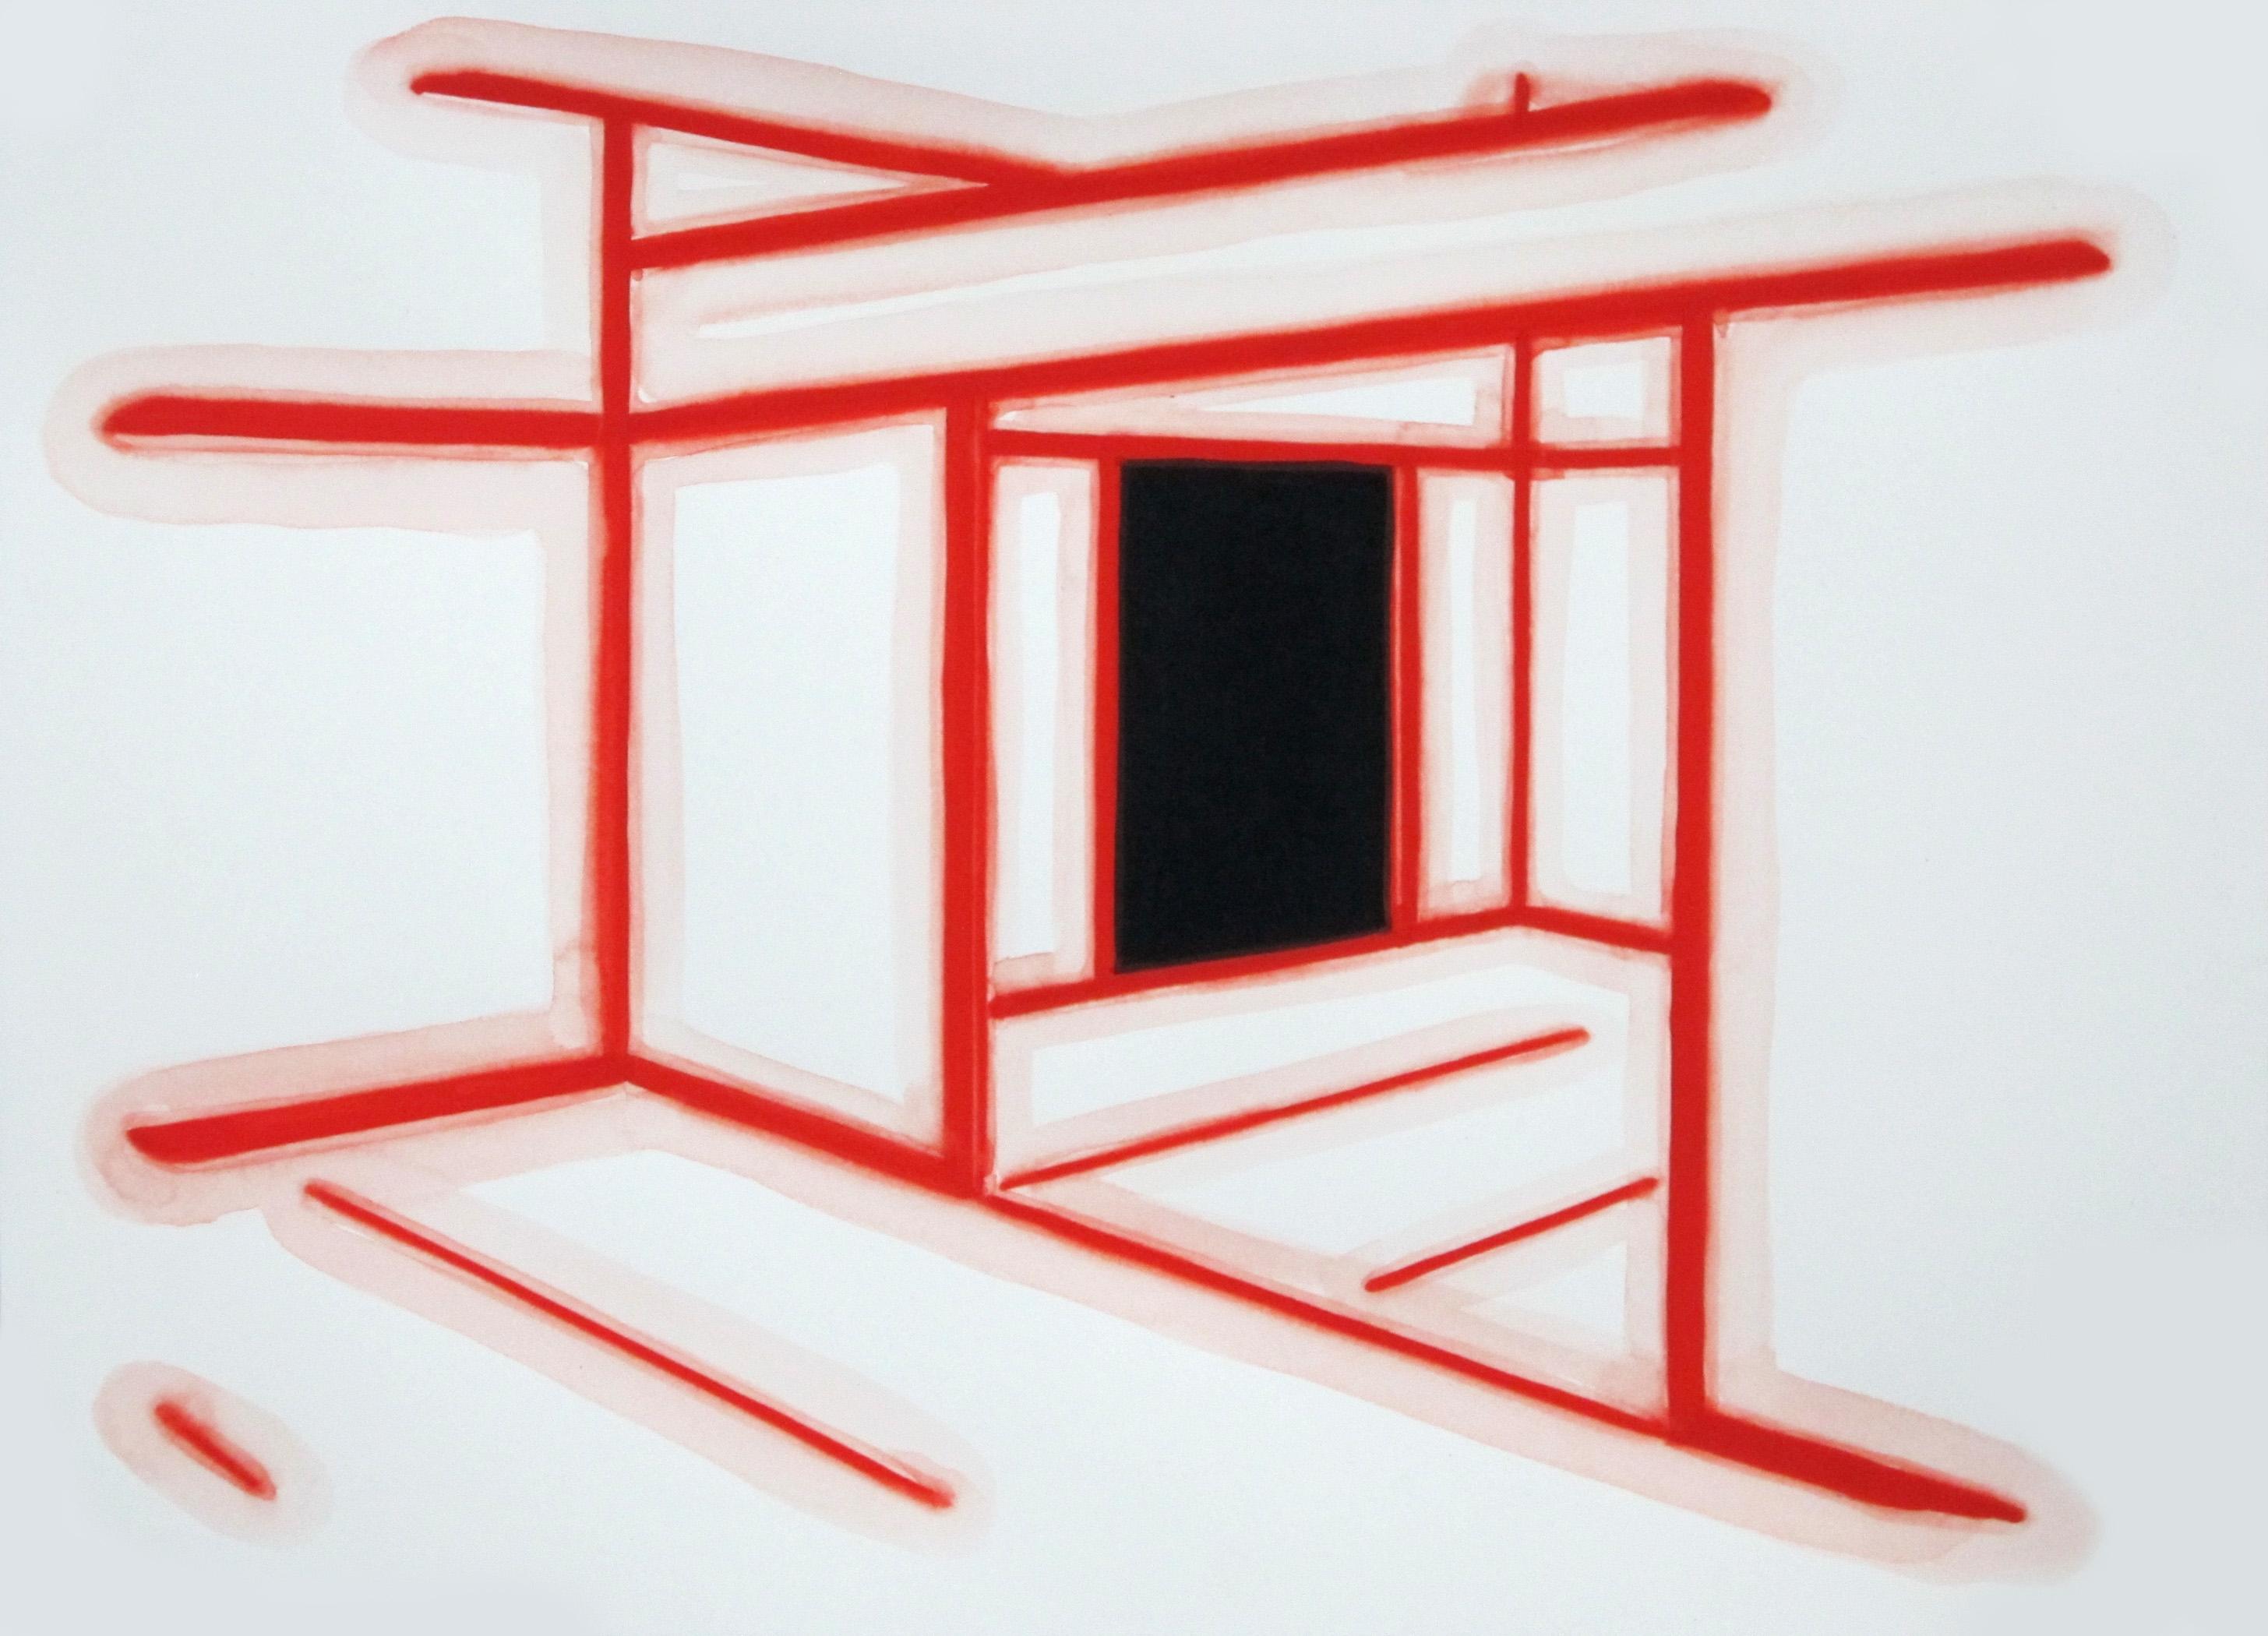 Interior III Gouache on Paper 11 x 14 in 2012